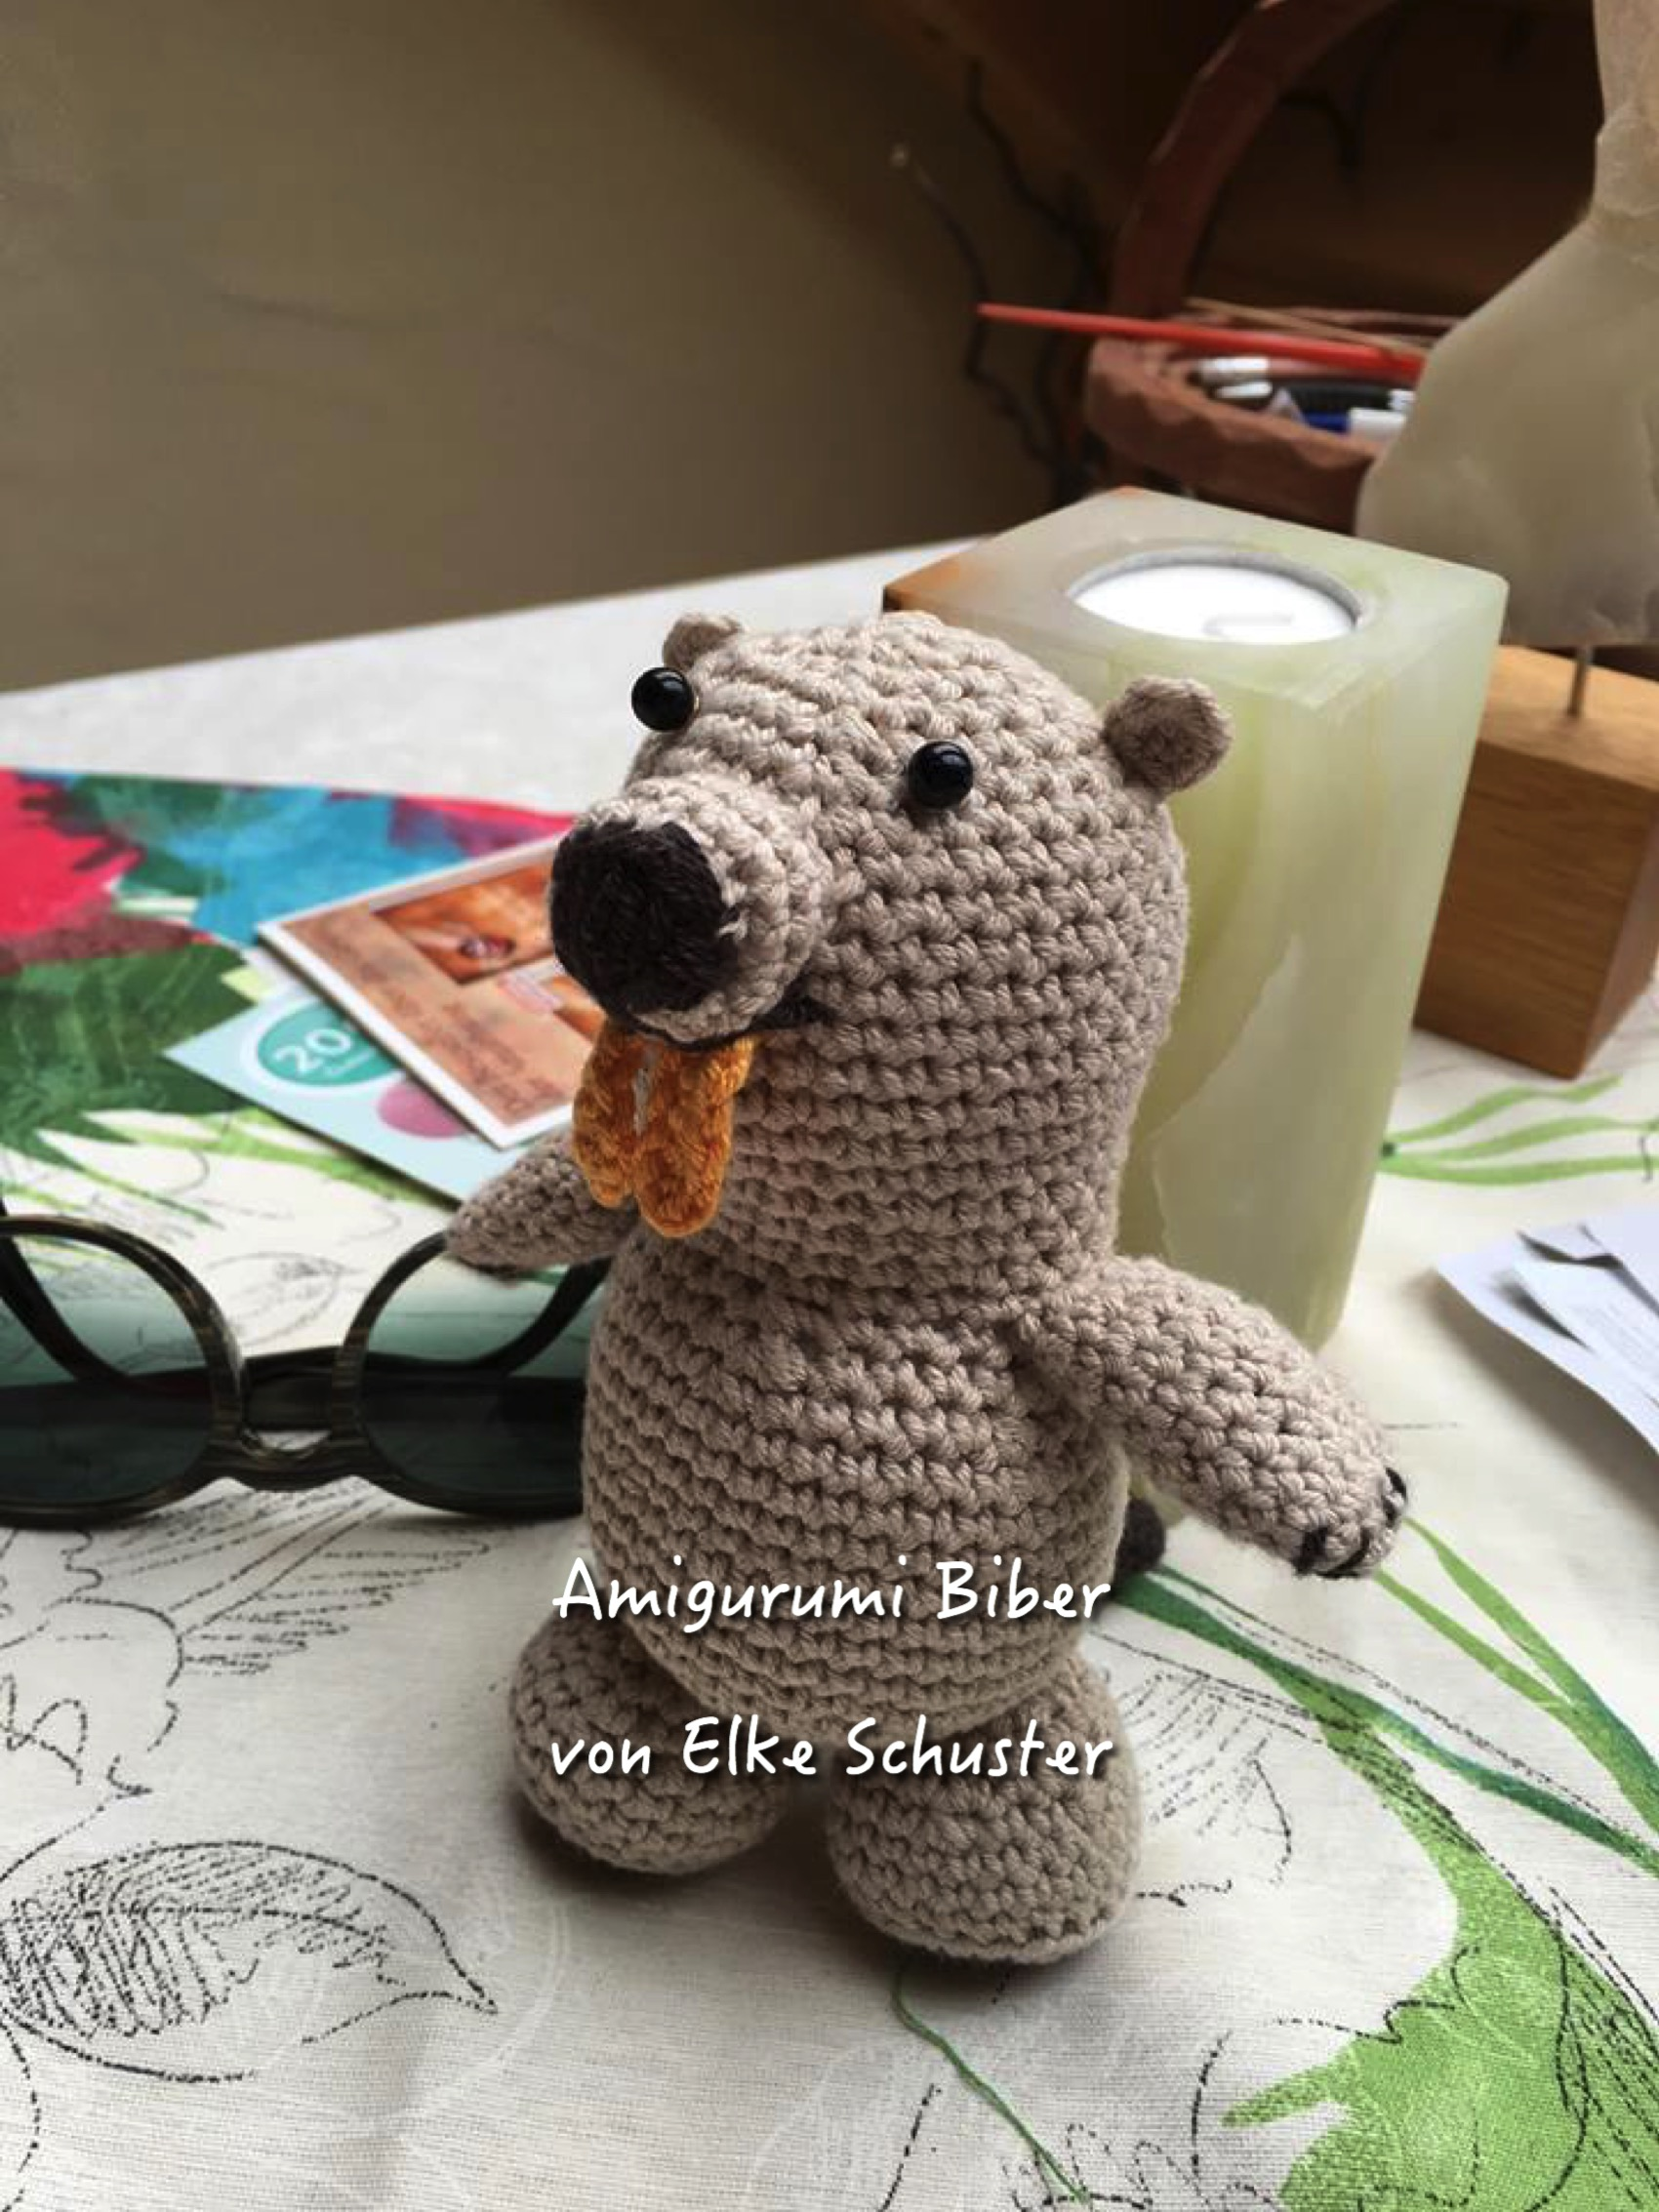 Amigurumi Biber von Elke Schuster